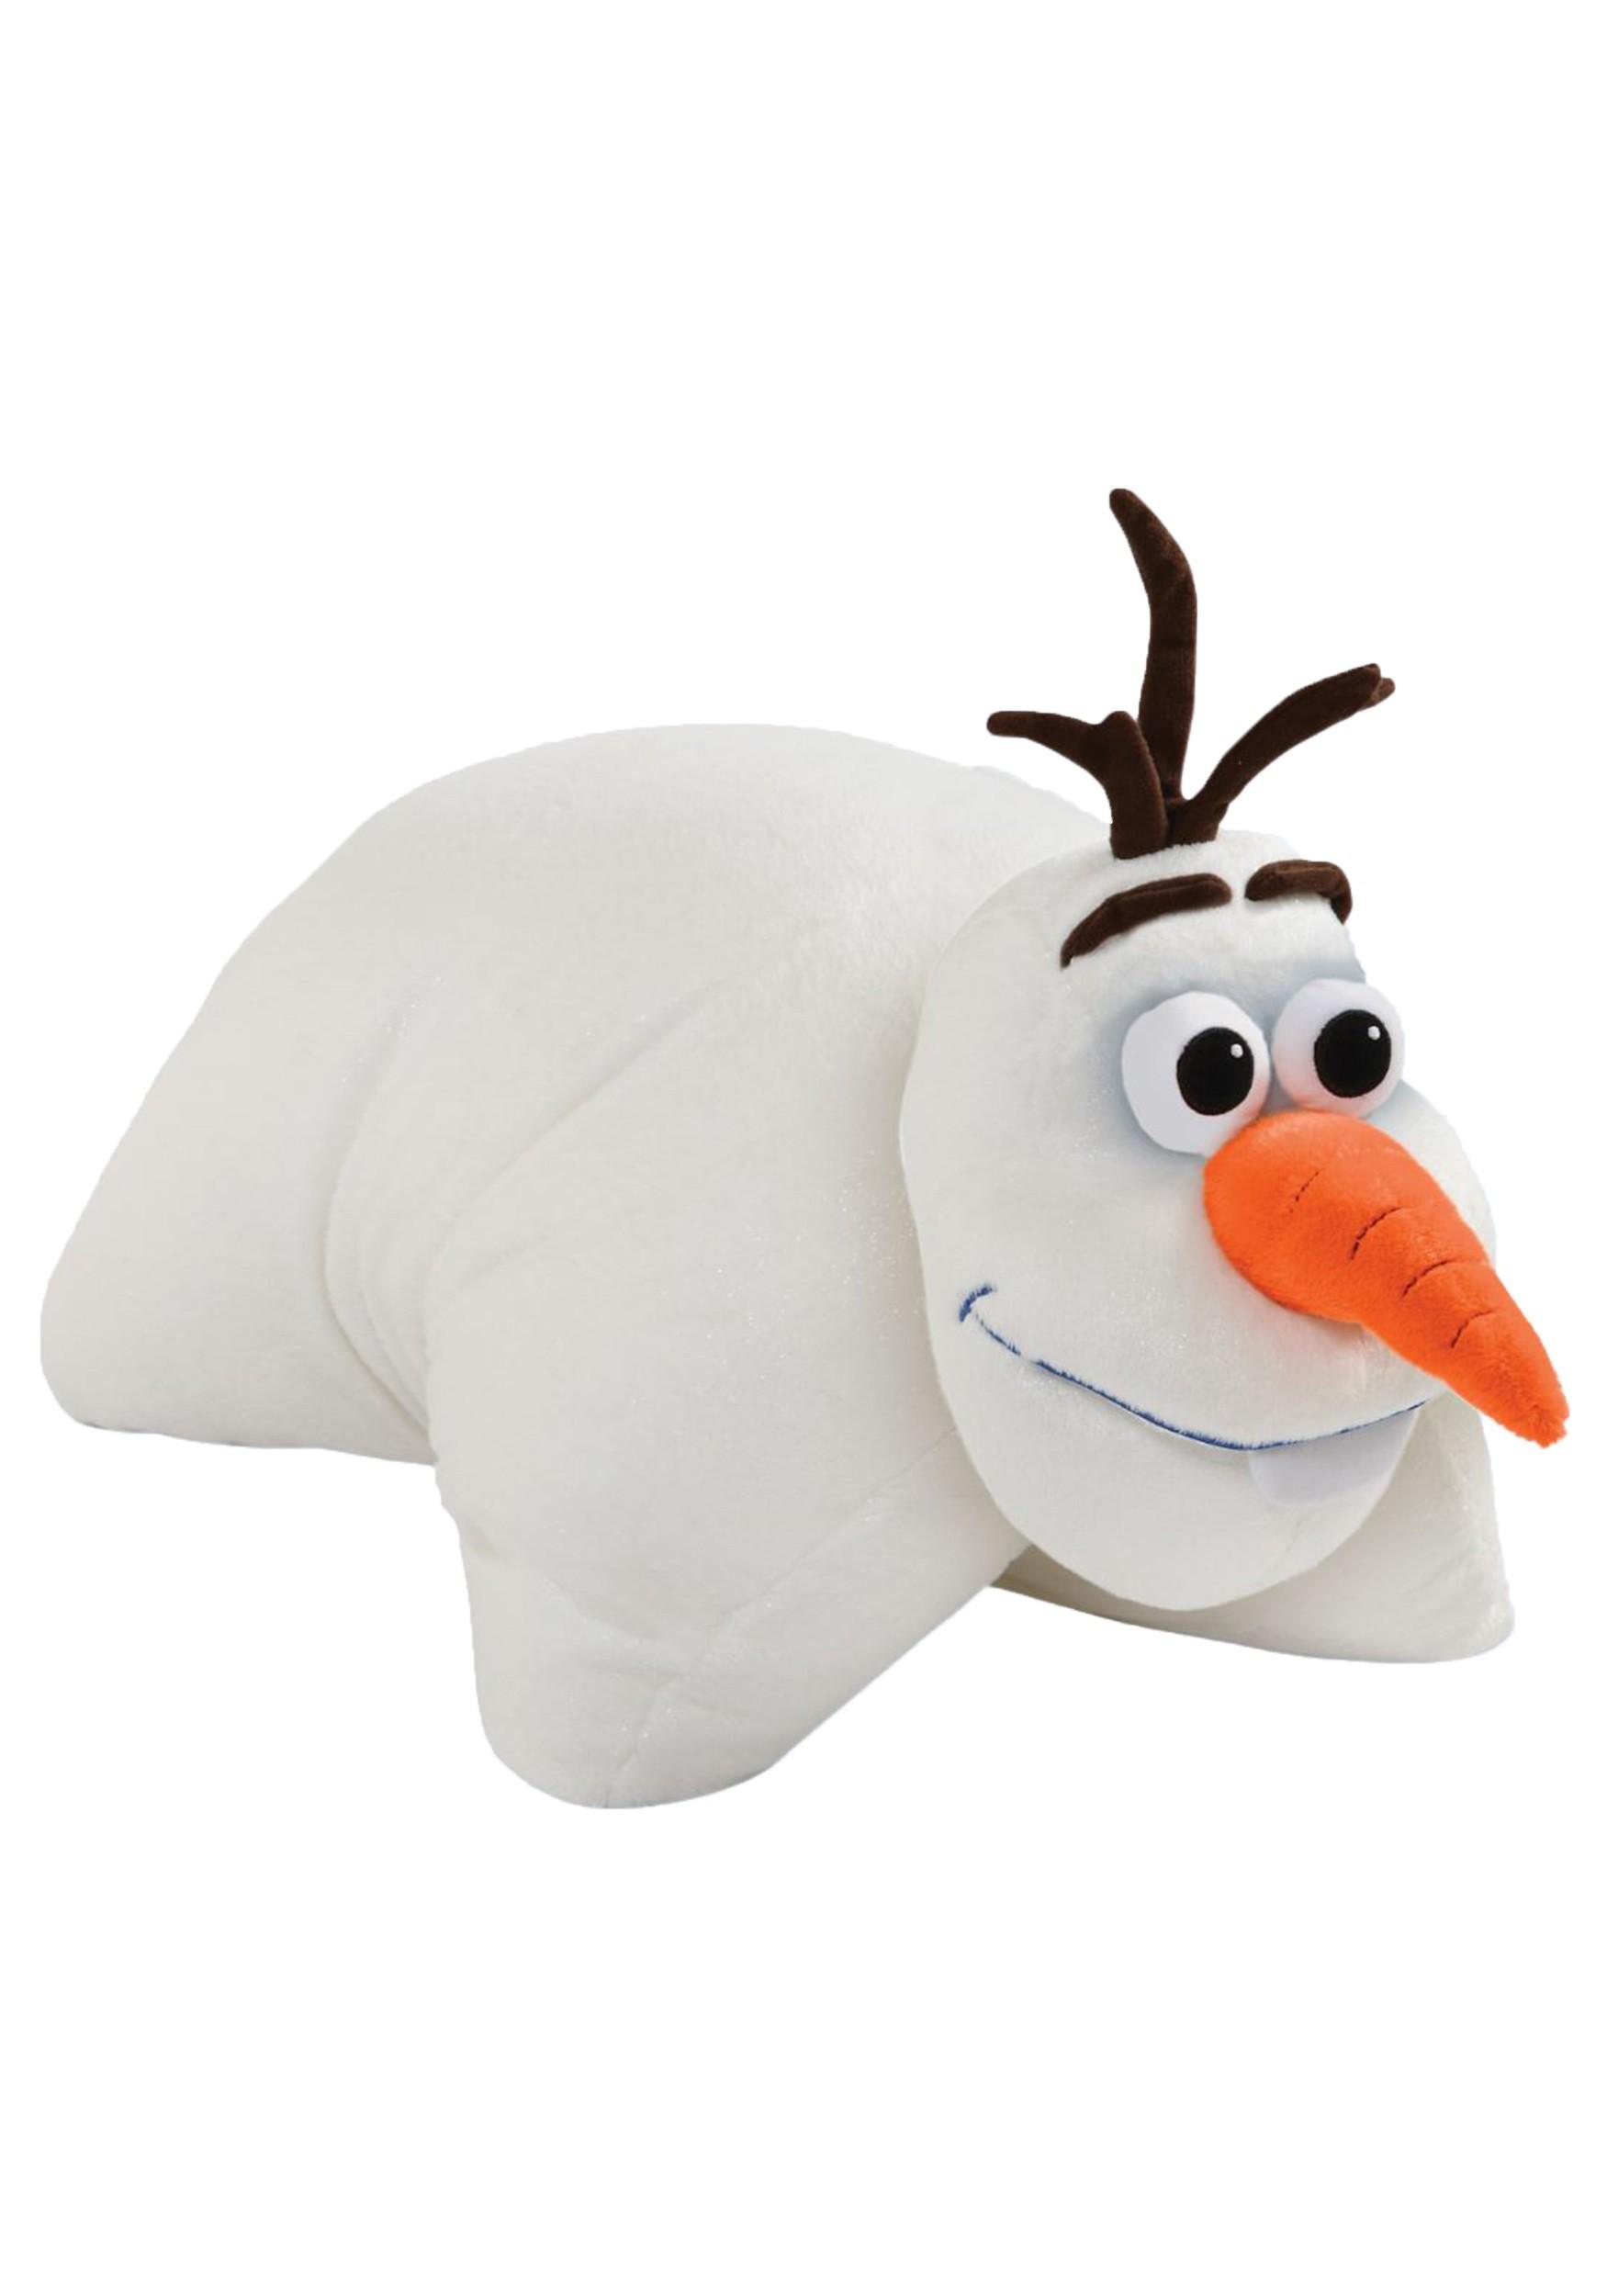 Frozen Jumbo 30 Quot Olaf Pillow Pet